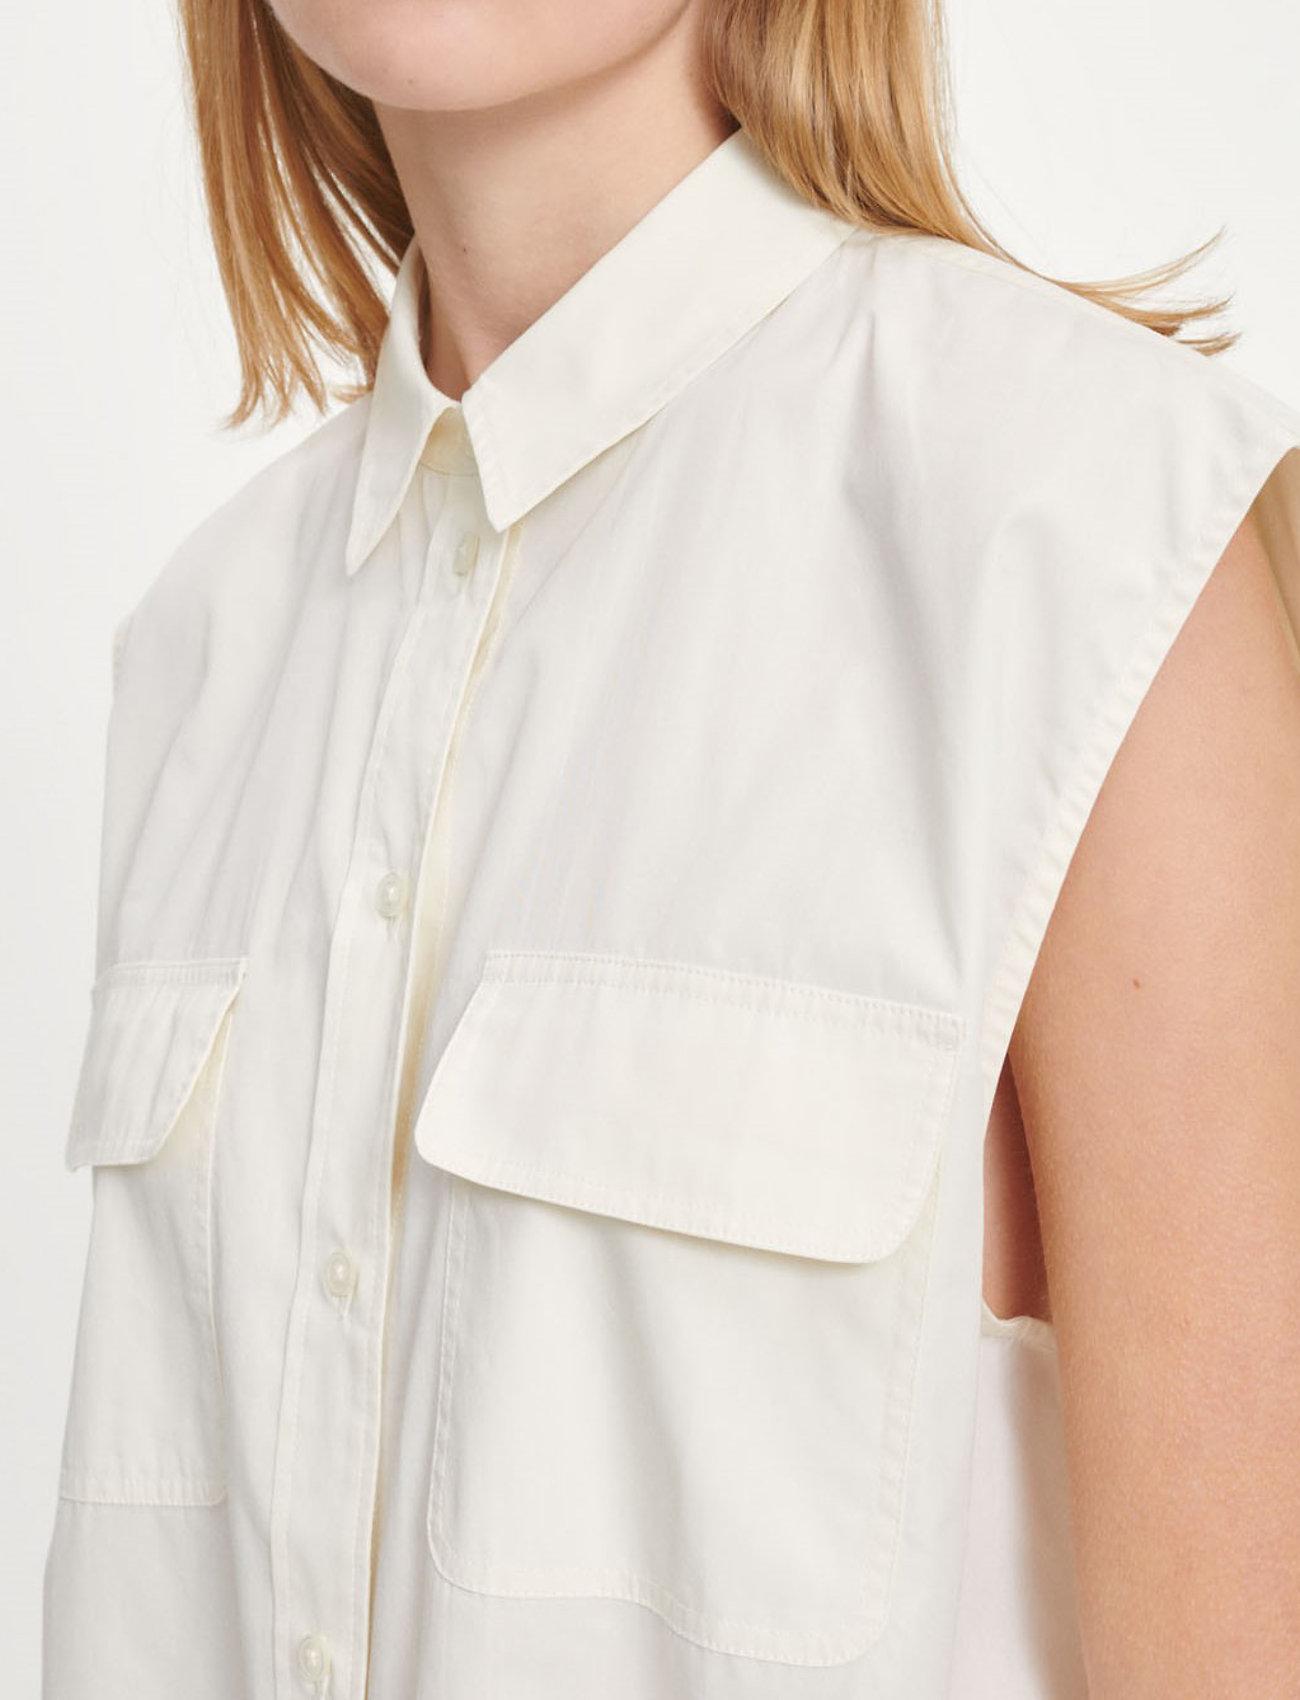 Samsøe Samsøe - Tea shirt top 11466 - denim shirts - antique white - 5